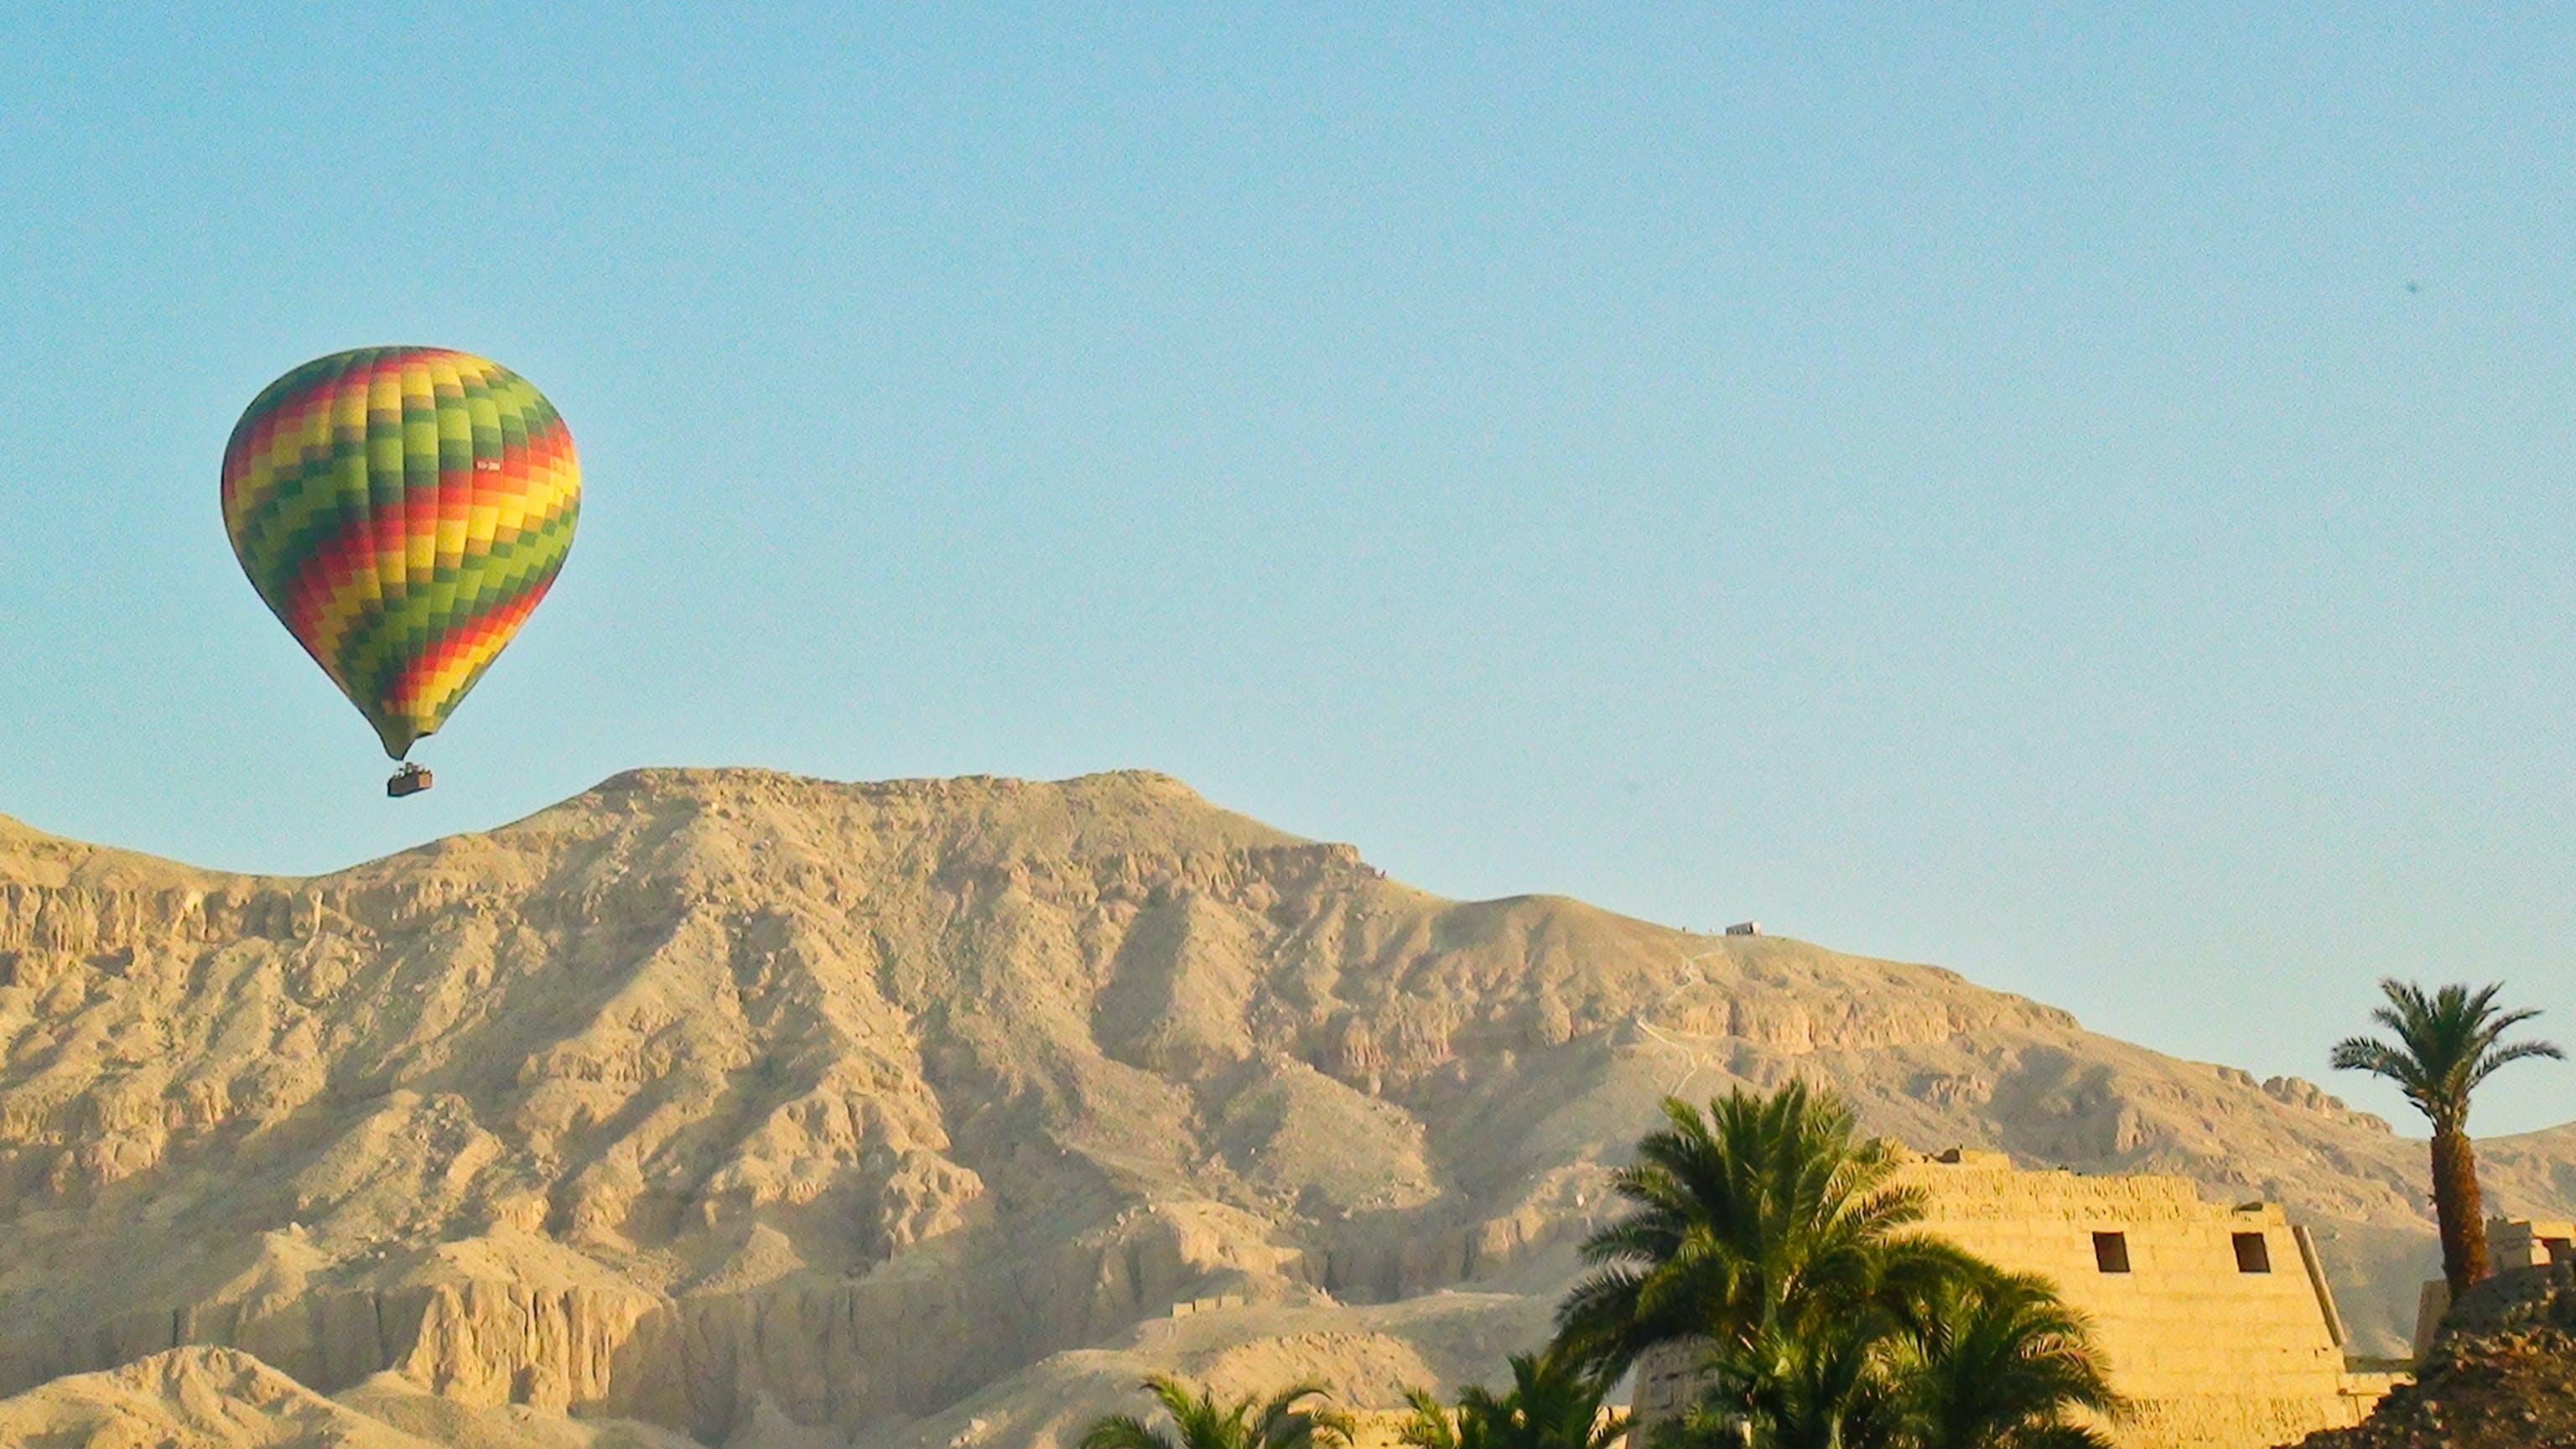 Kostenloses Stock Foto zu heißluftballon